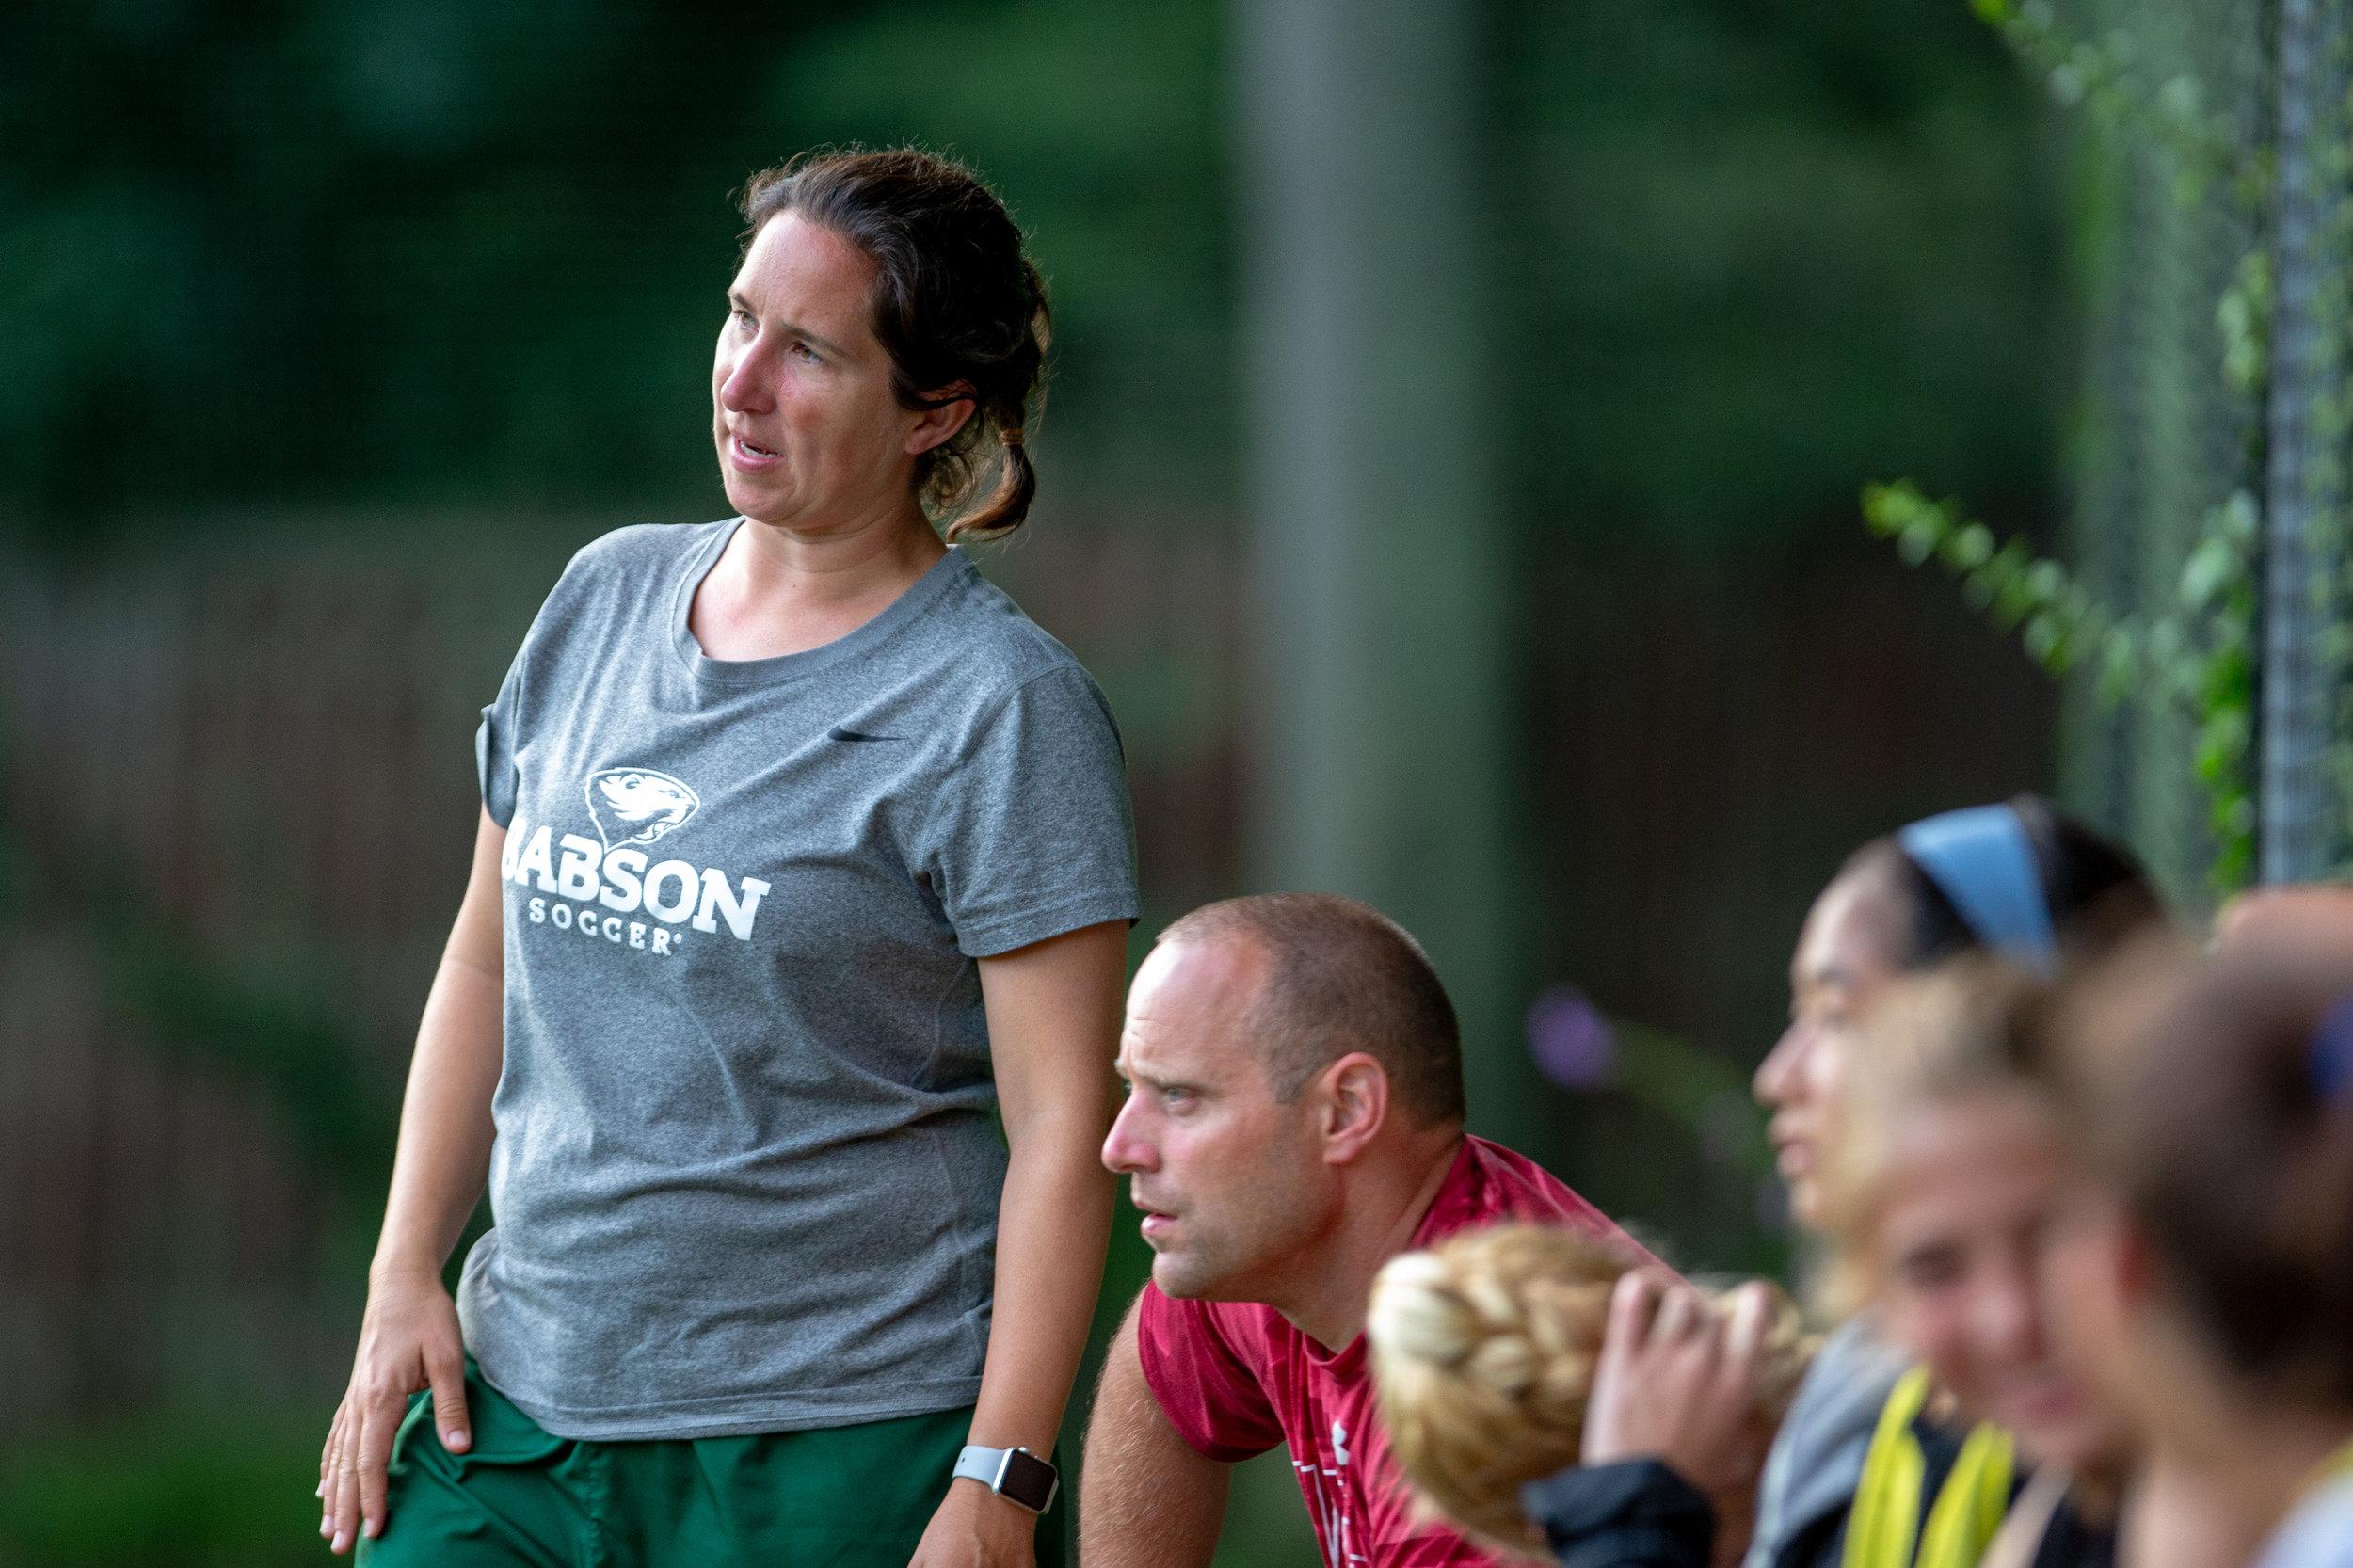 Babson MIT girls soccer camp college Massachusetts